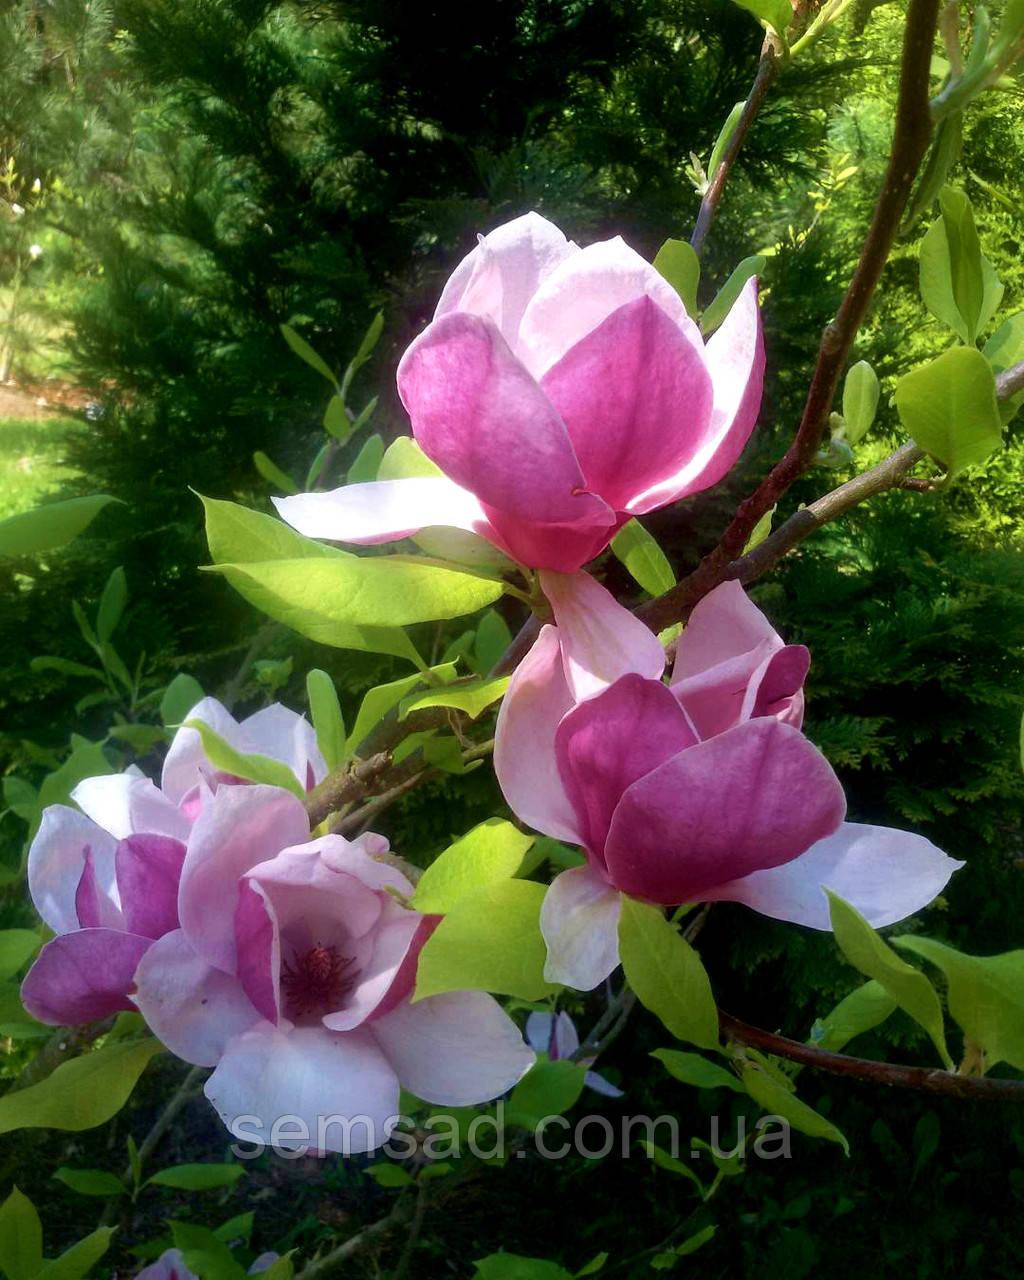 Магнолия суланжа Вербаника \ Magnolia soulangiana Verbanica  ( саженцы 2 года)